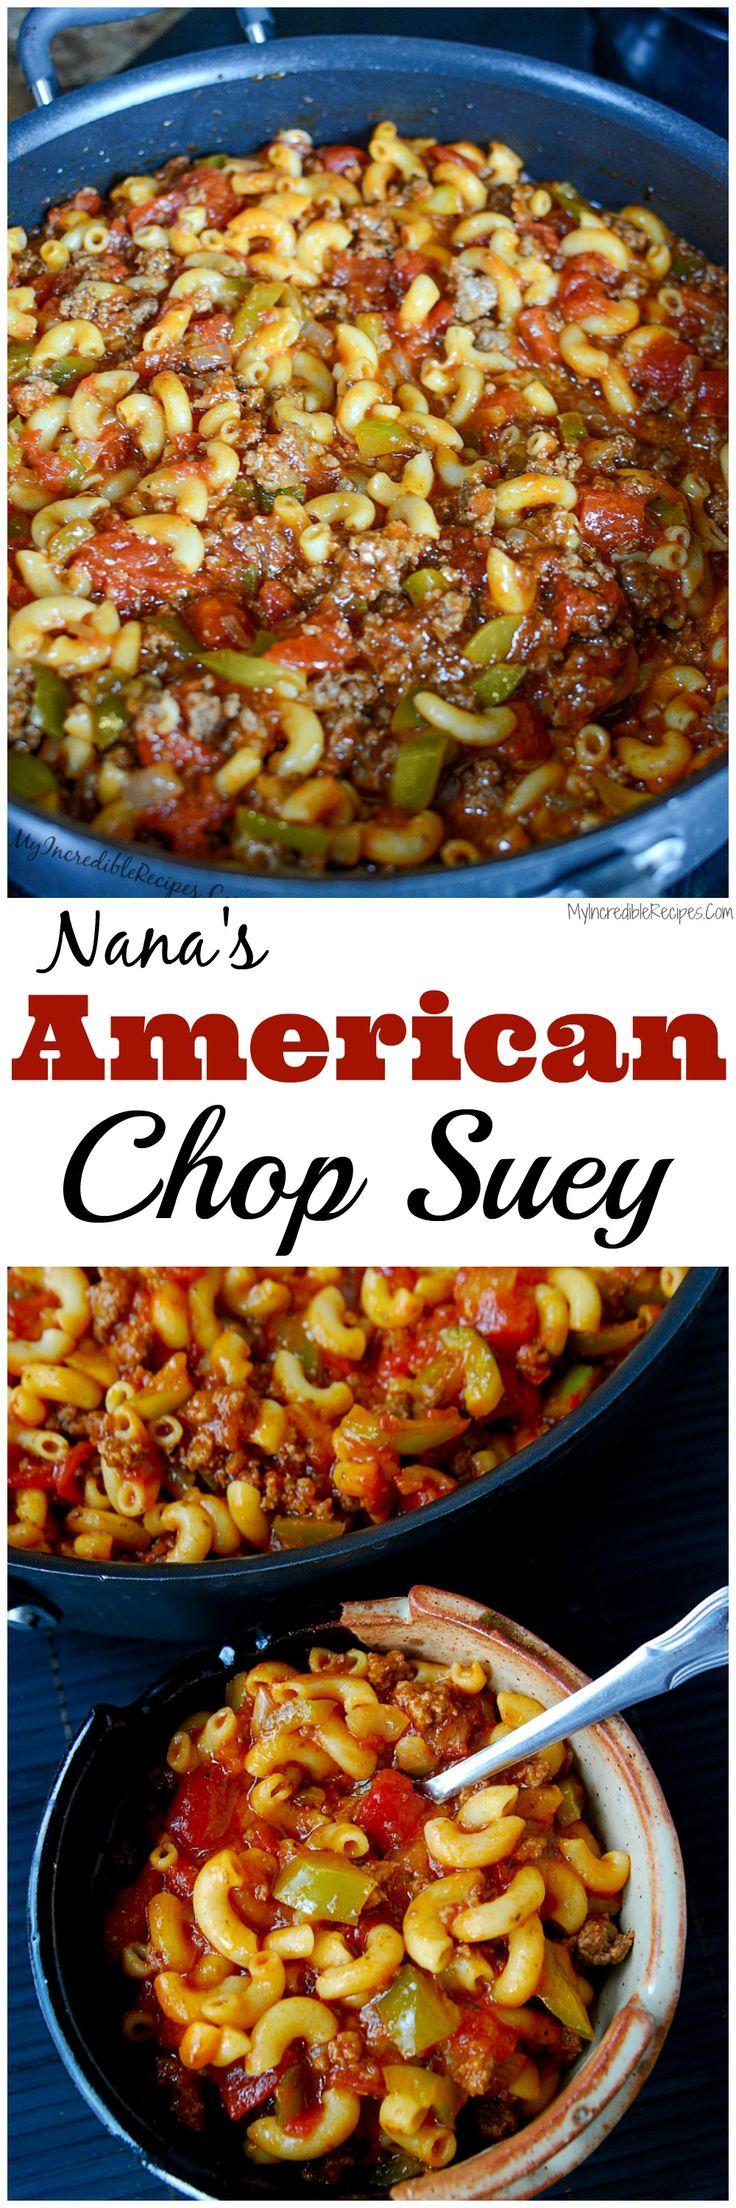 Nana's American Chop Suey!